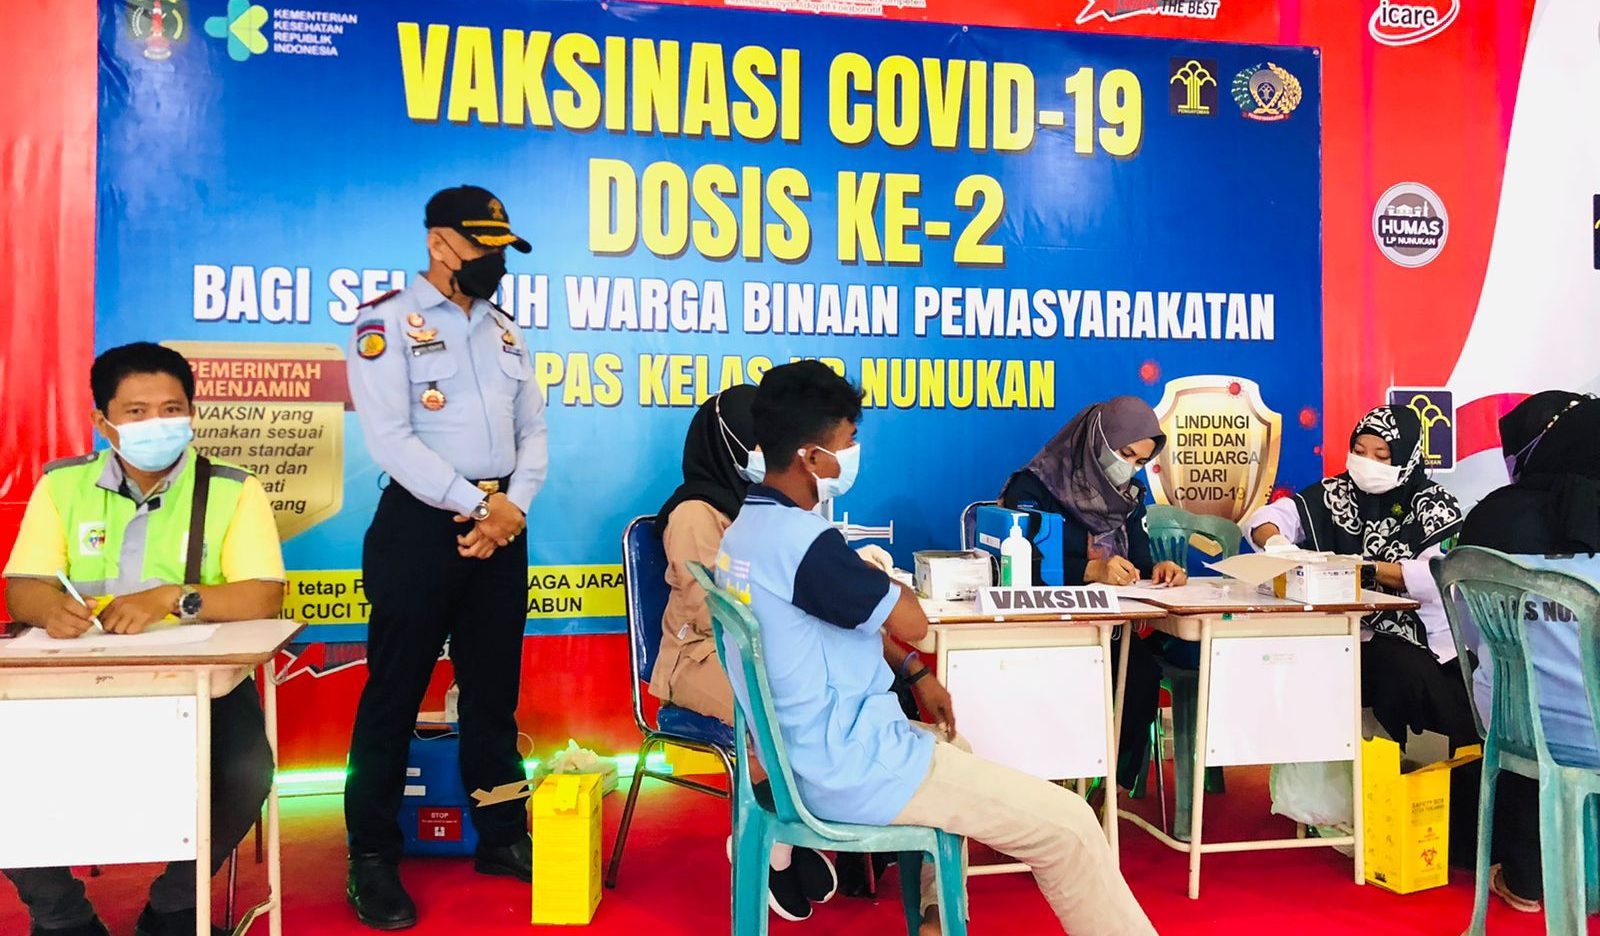 Vaksinasi Dosis II